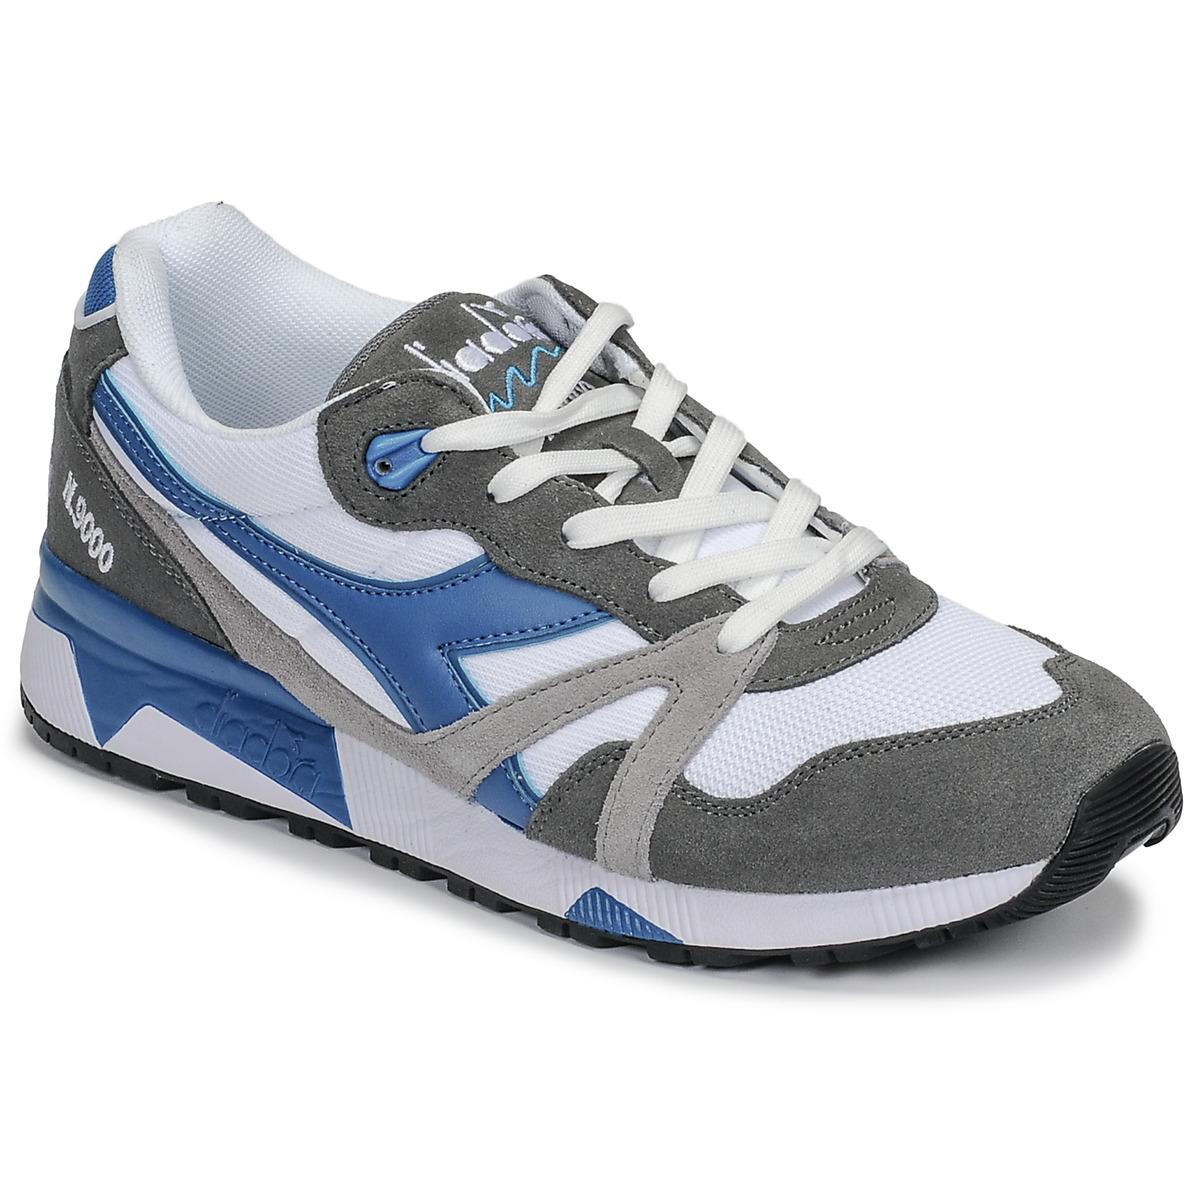 Sneakers Diadora  N 9000 III